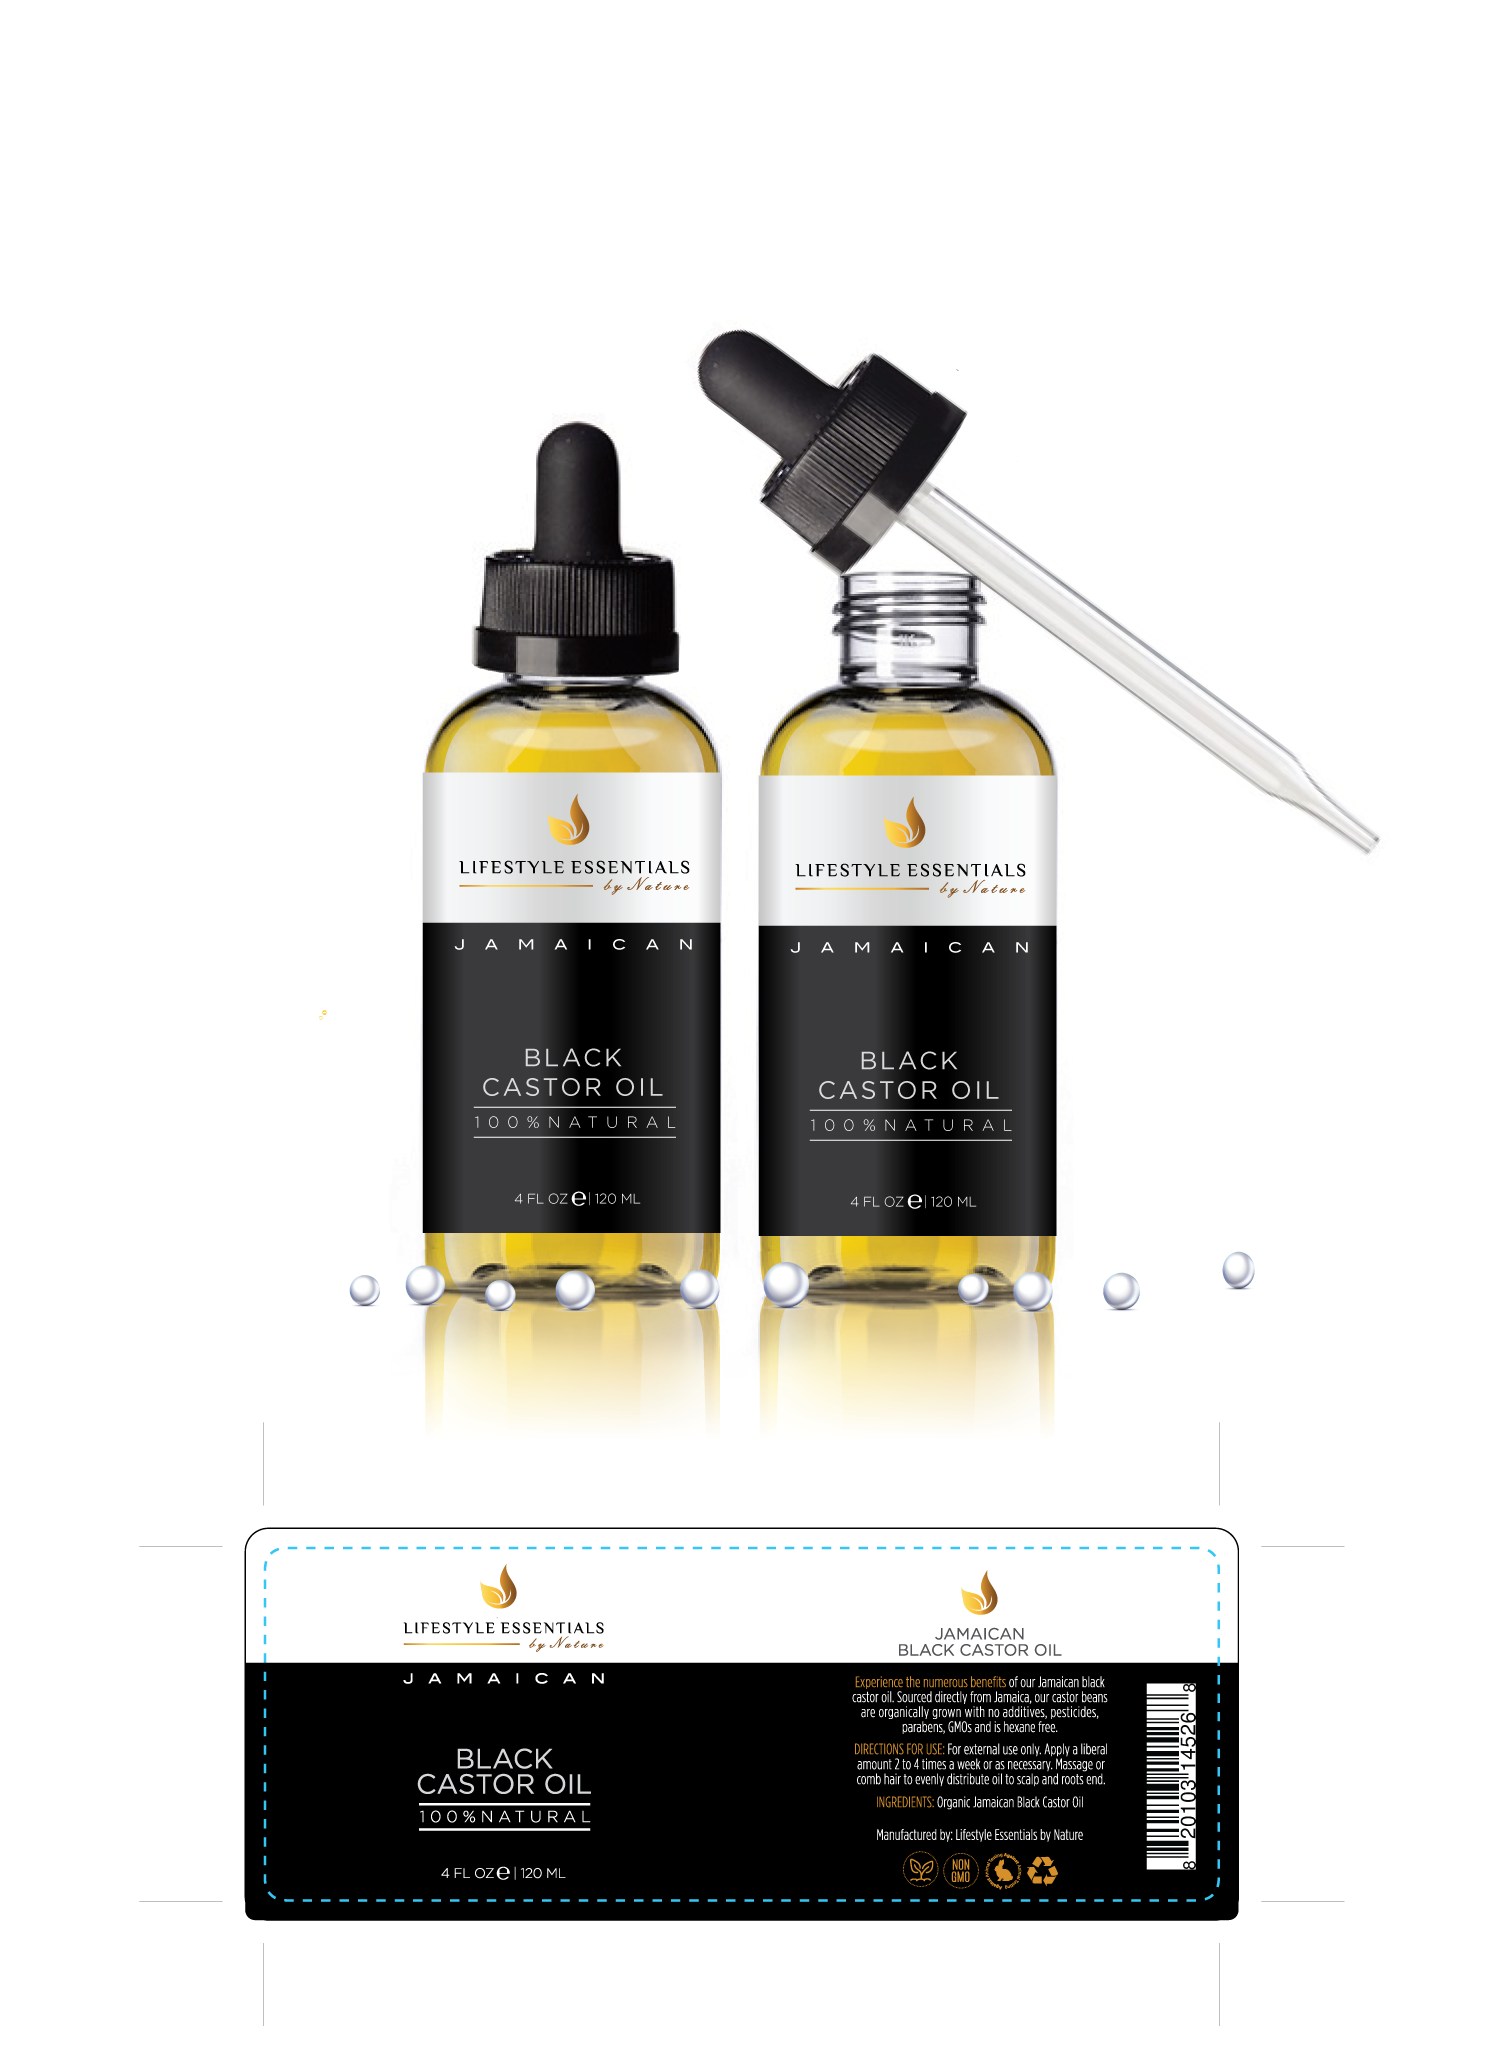 Product label for a jamaican black castor oil bottle